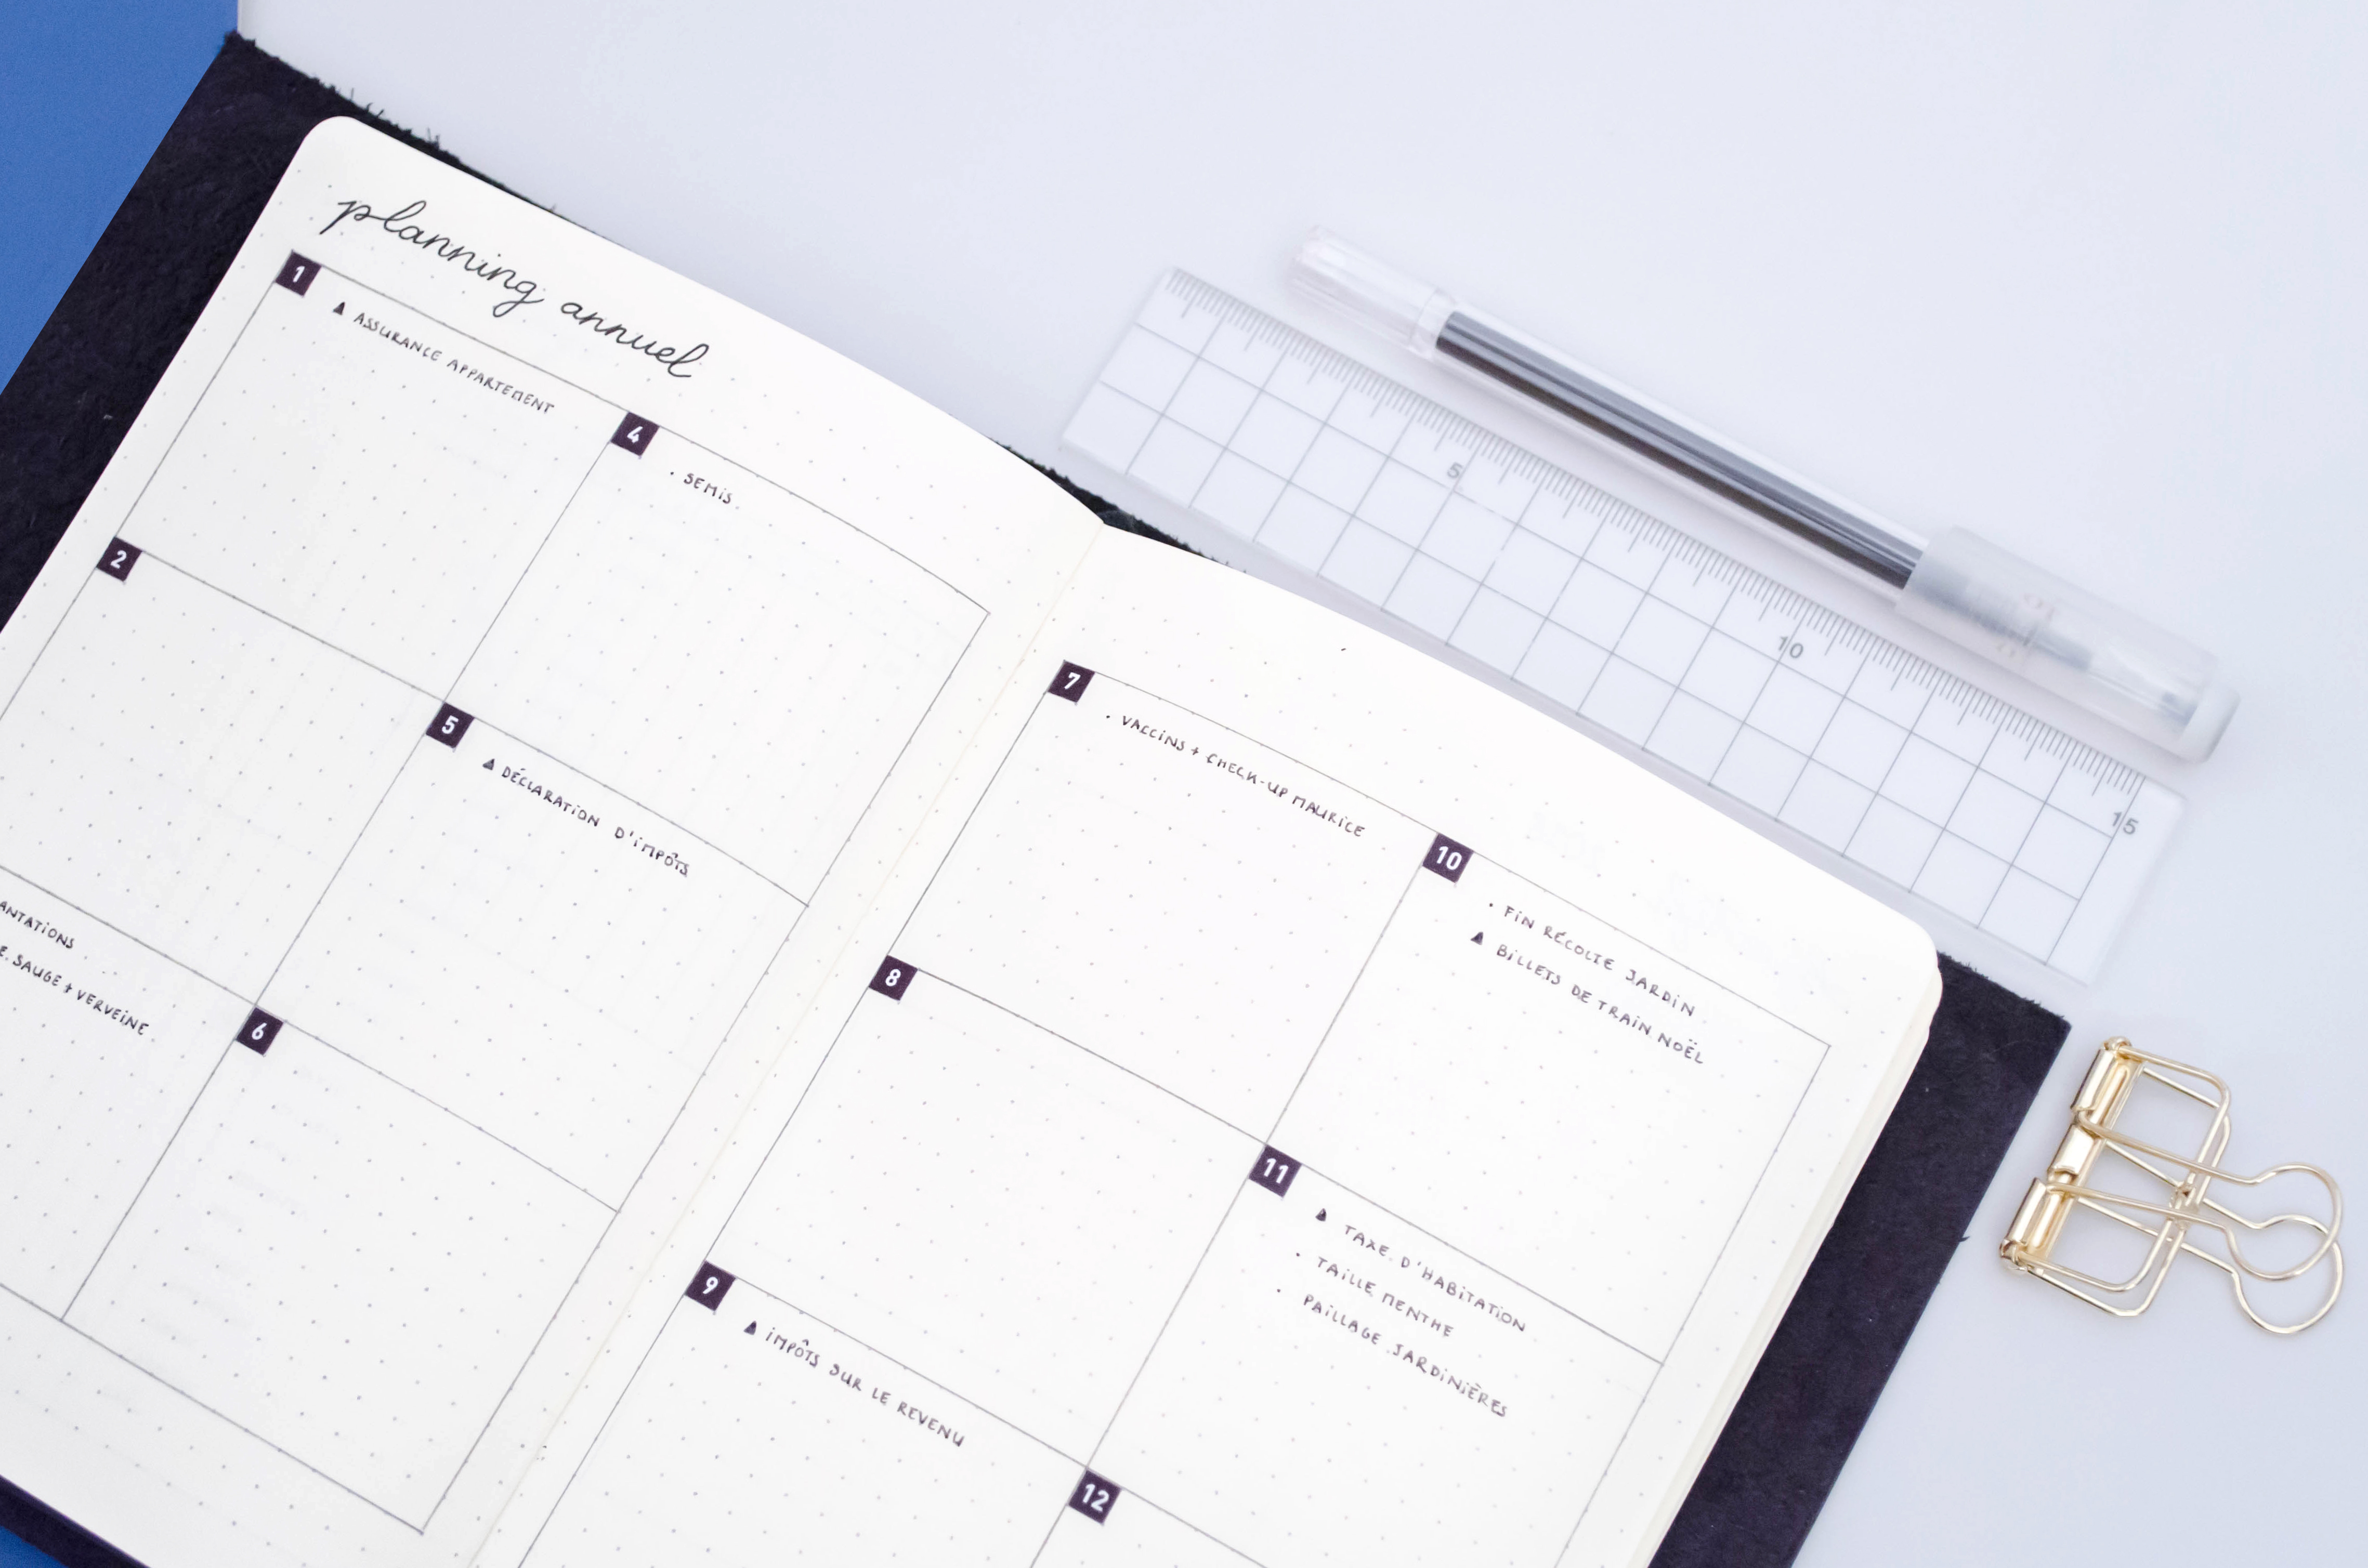 Calendrier 2019 Bullet Journal.2018 Bullet Journal Supplies Planning Process And Set Up